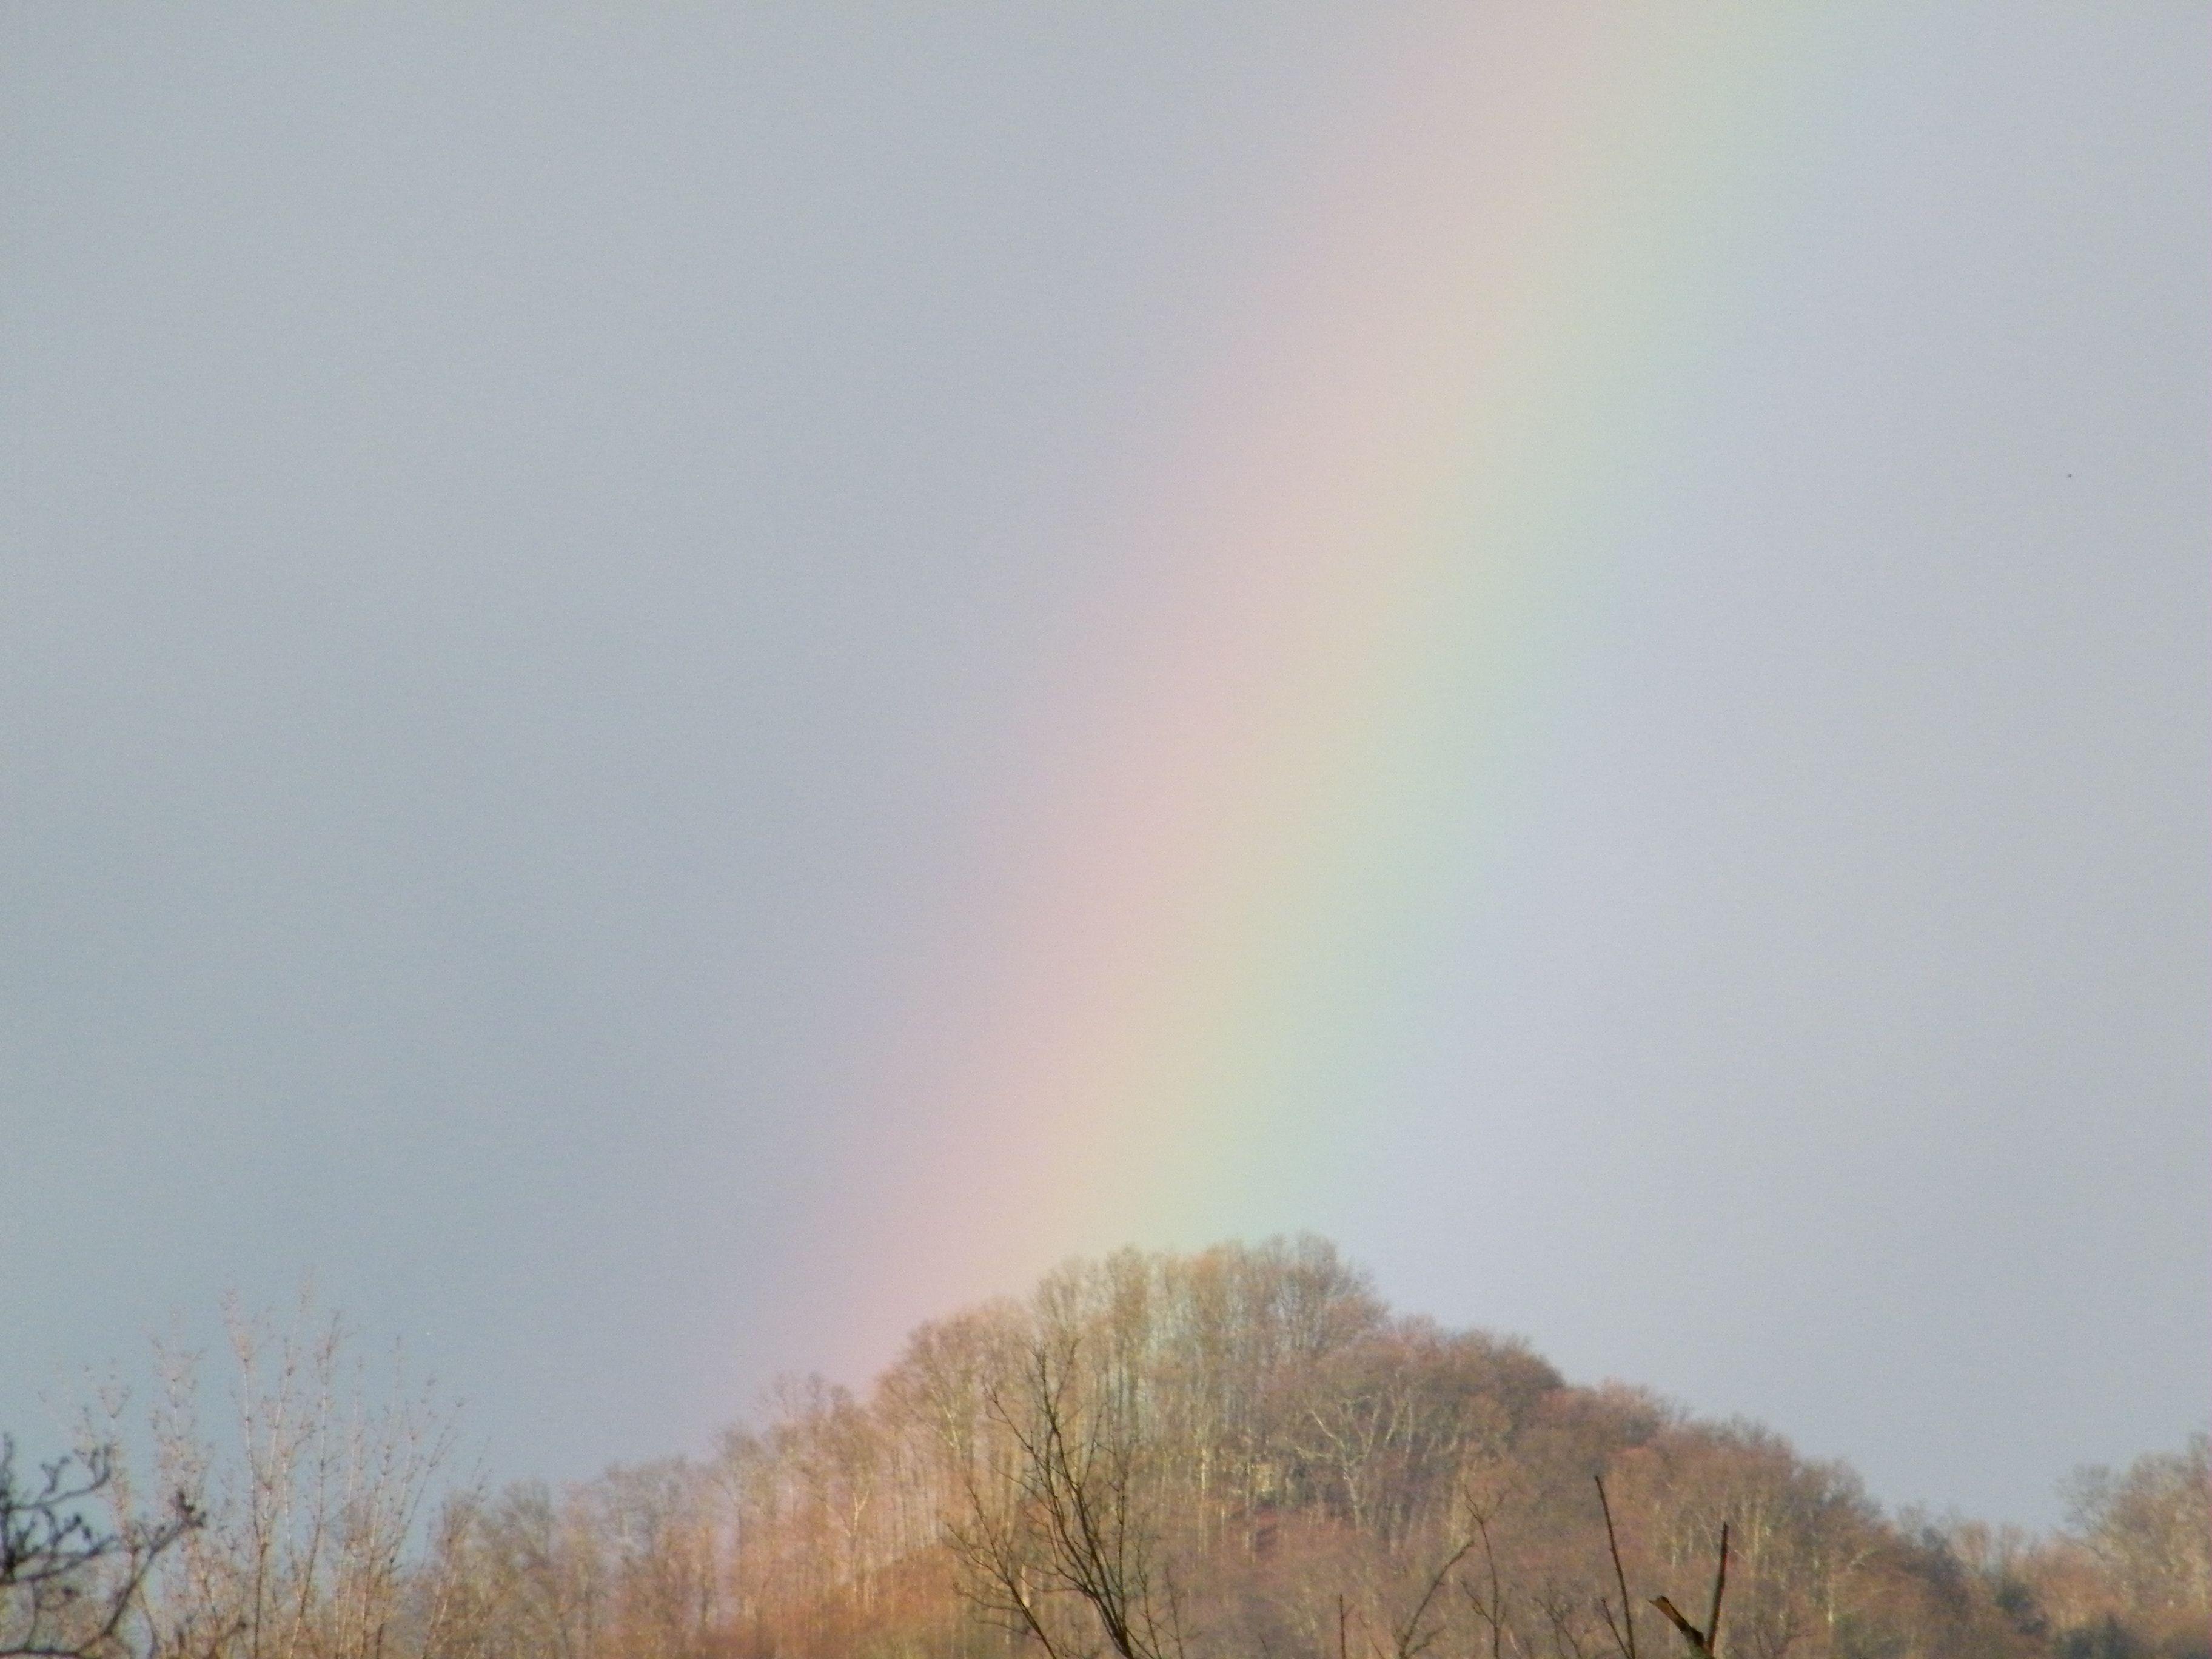 Rainbow over Harlan KY Rainbow over Harlan